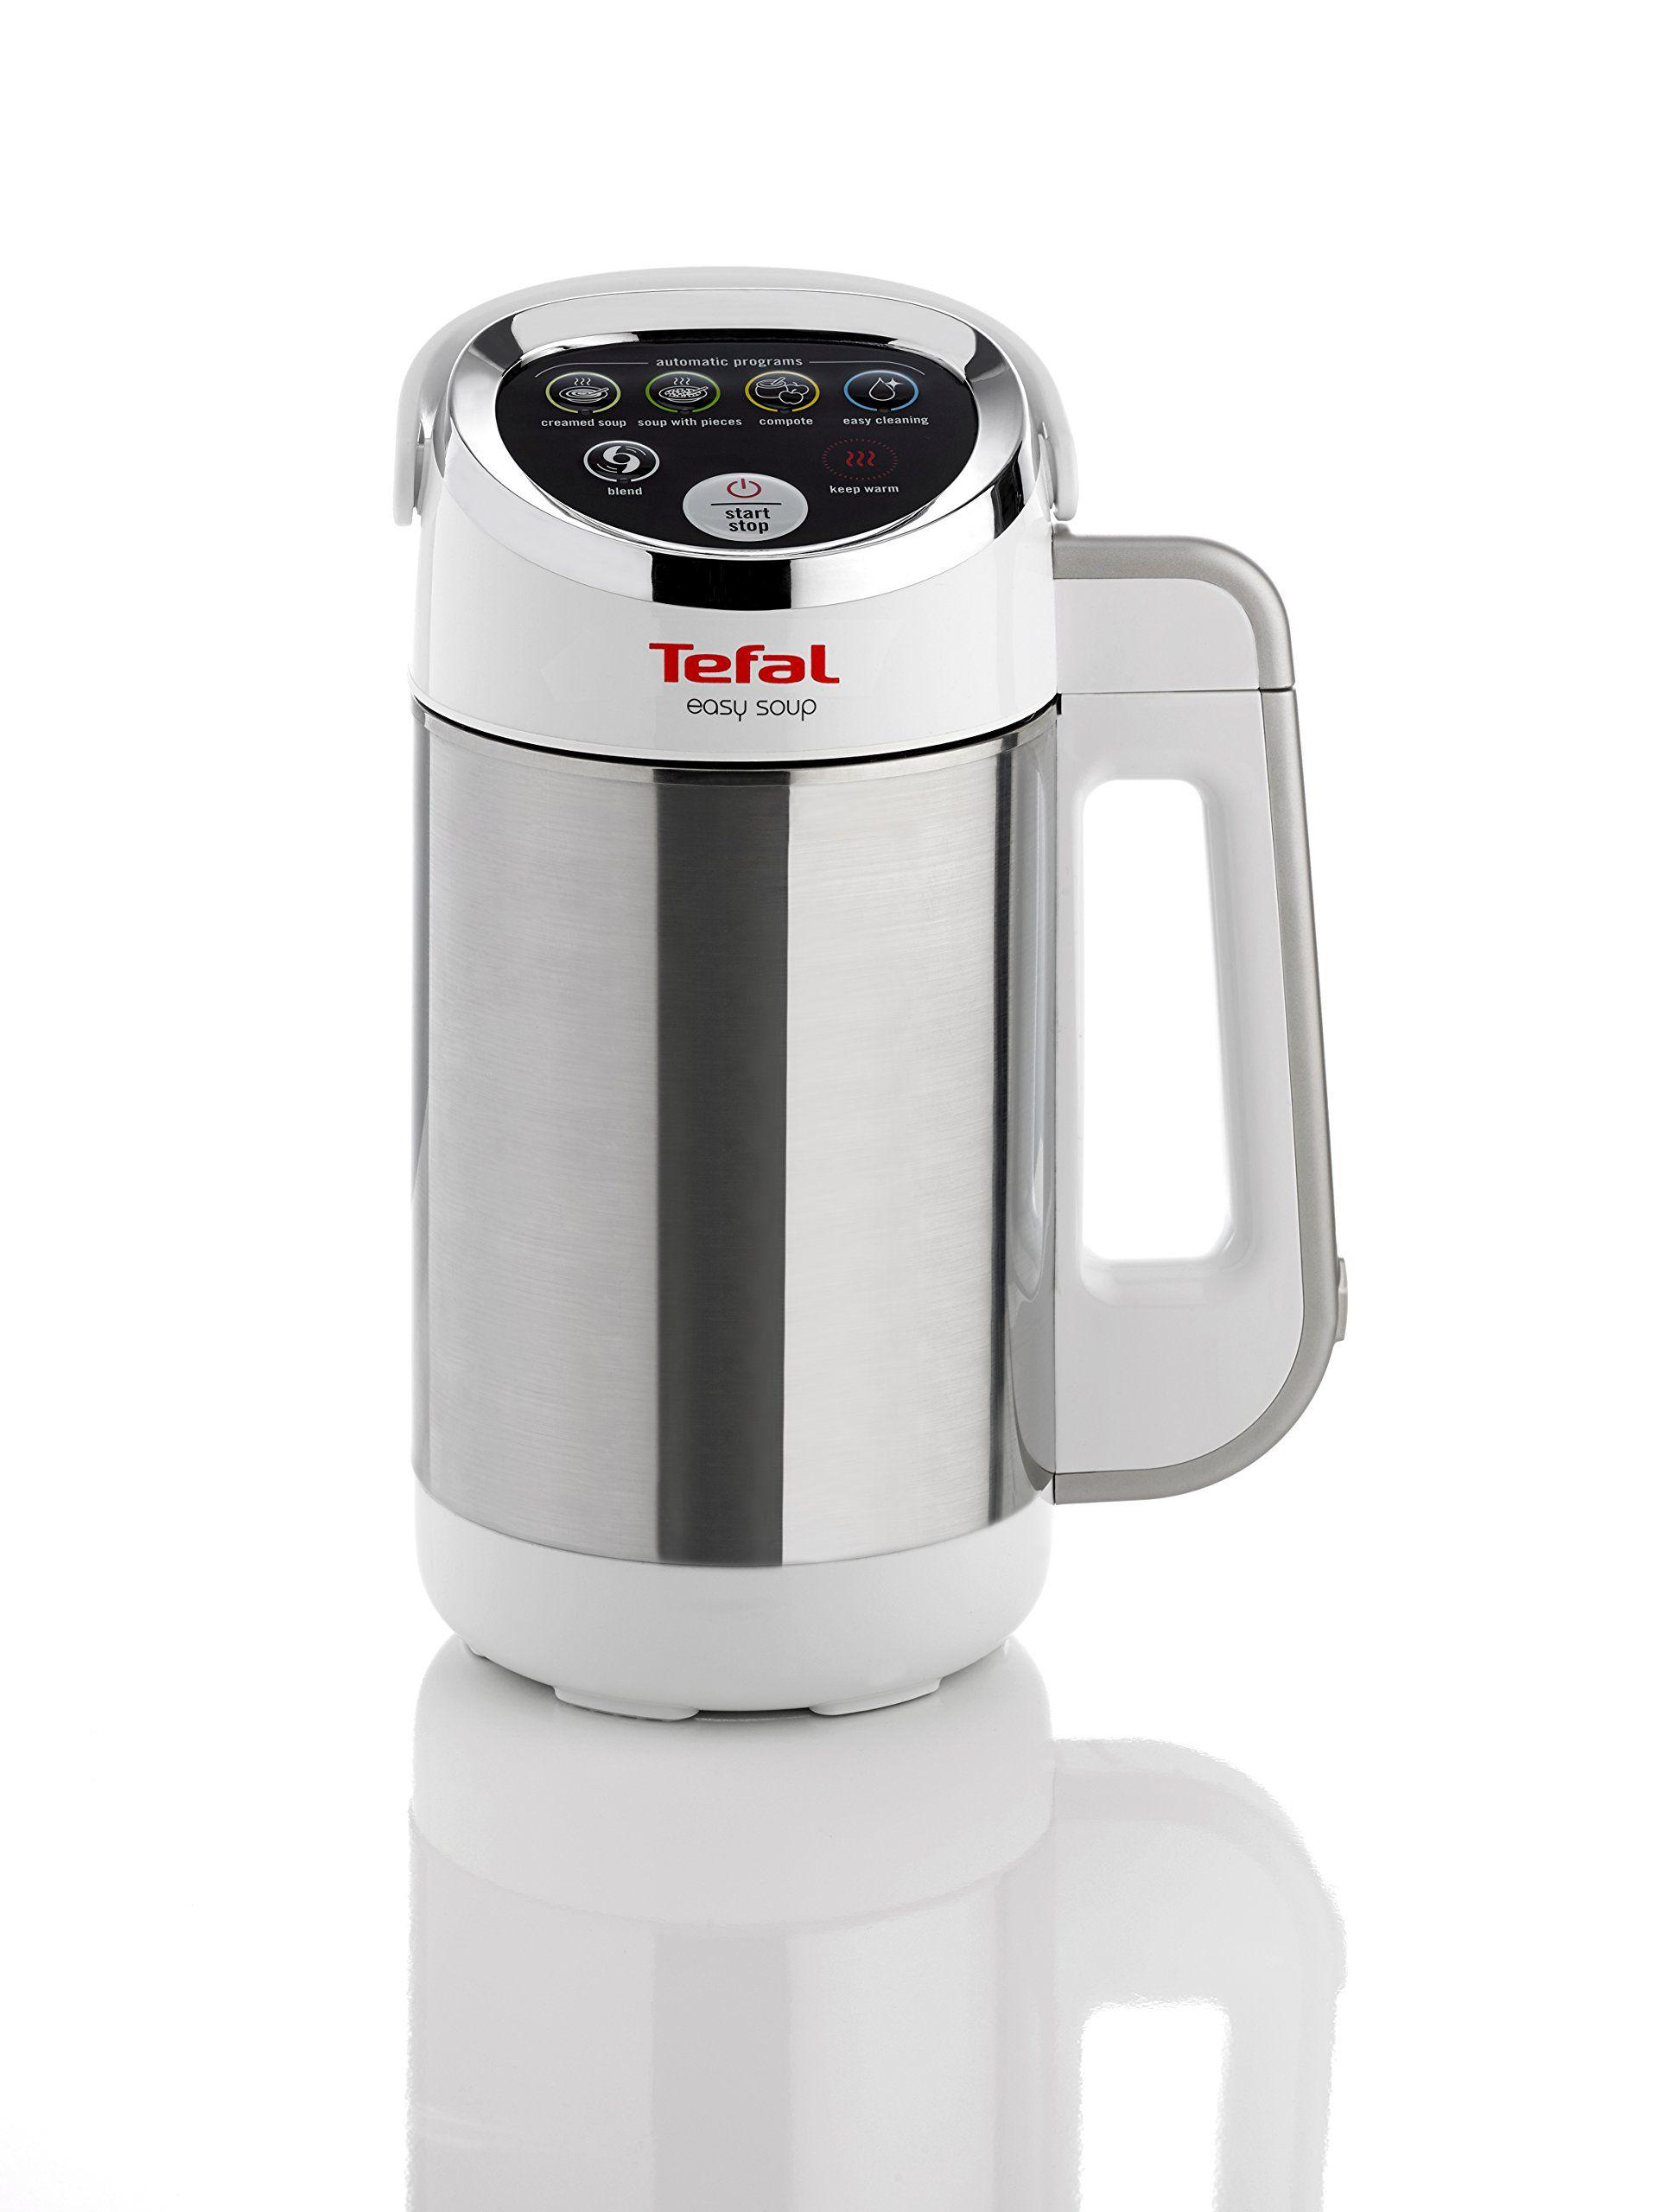 Tefal Easy Soup Automatic Soup Maker | Cool stuff | Pinterest ...